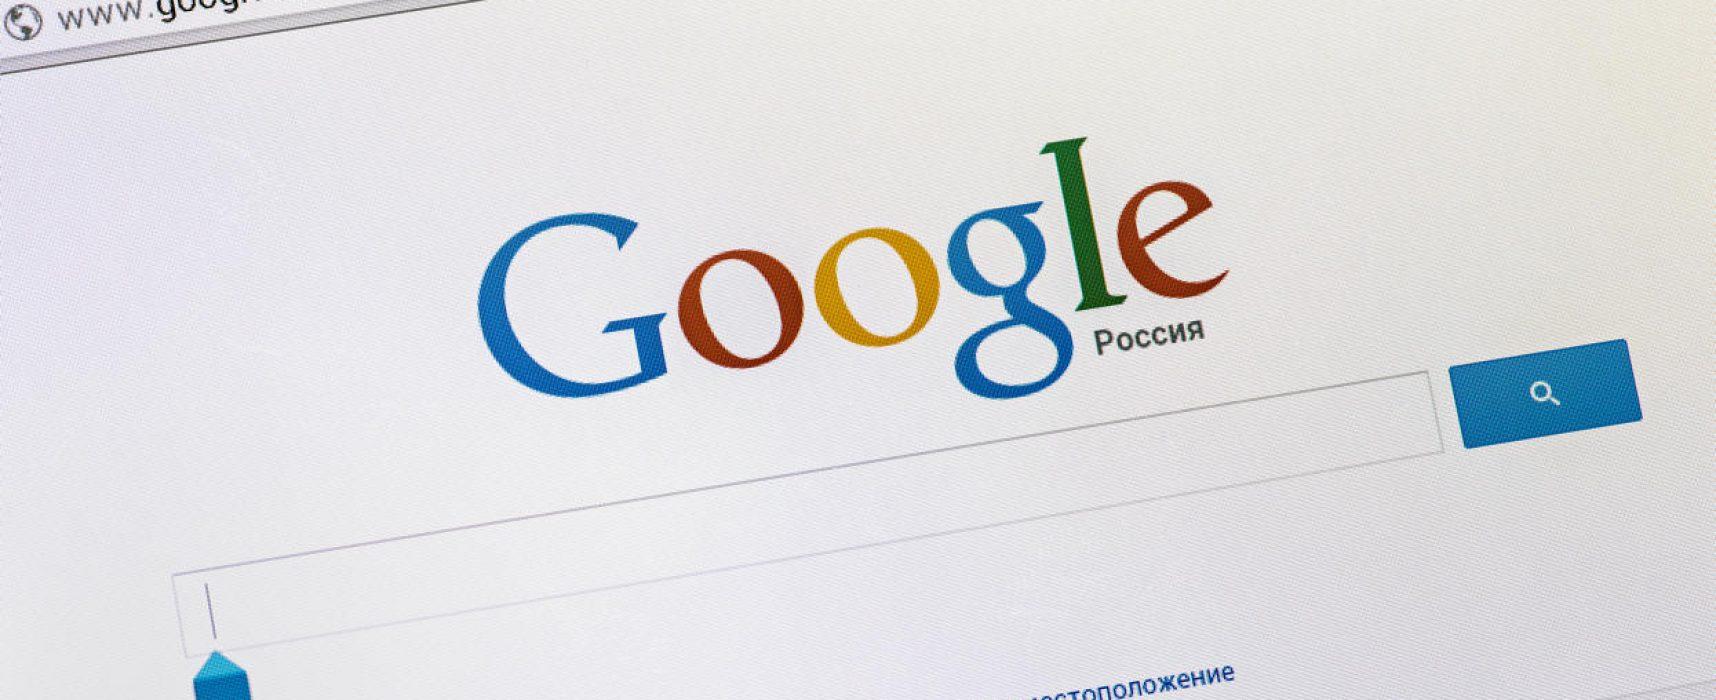 Russia briefly bans Google.ru